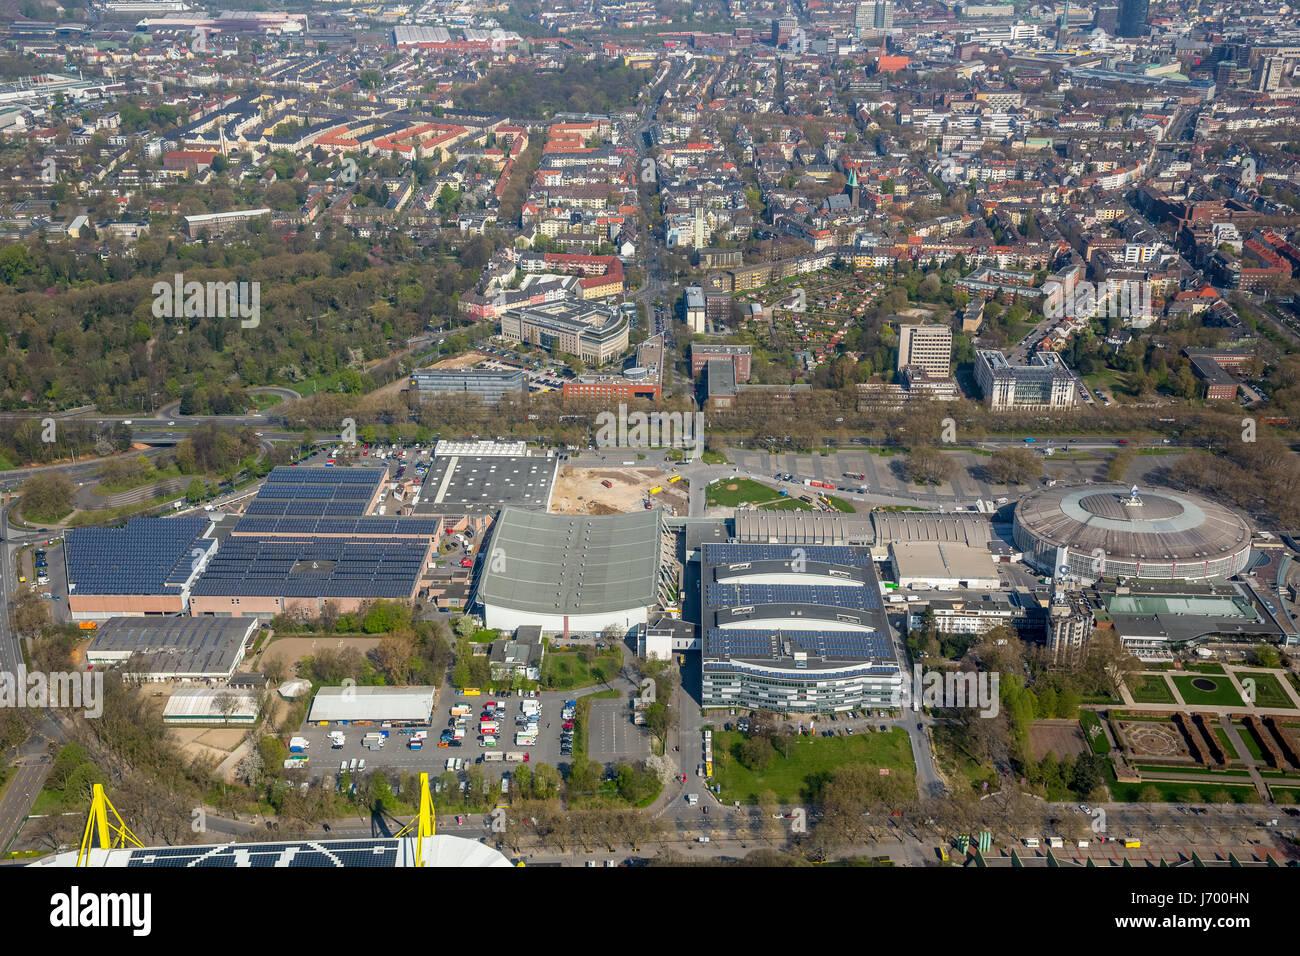 Exhibition, Exhibition Center, City Council of Dortmund, Westfalenhallen, Steigenberger Hotel near the SignalIdunaPark, - Stock Image